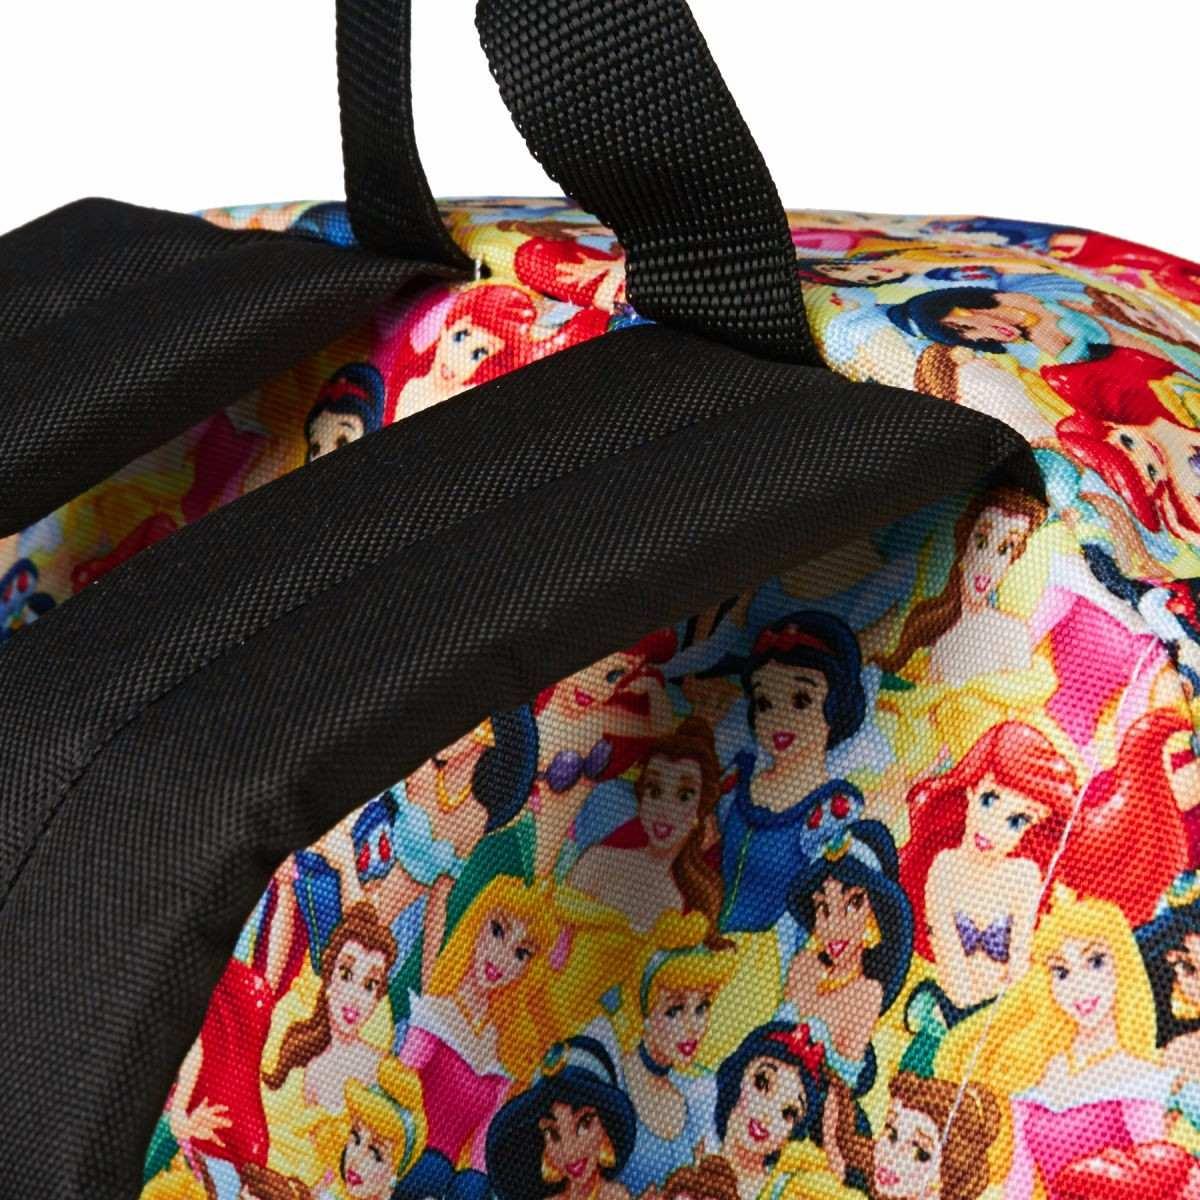 0f7b8e6208a0b Mochila Vans Princesas Disney -   799.00 en Mercado Libre